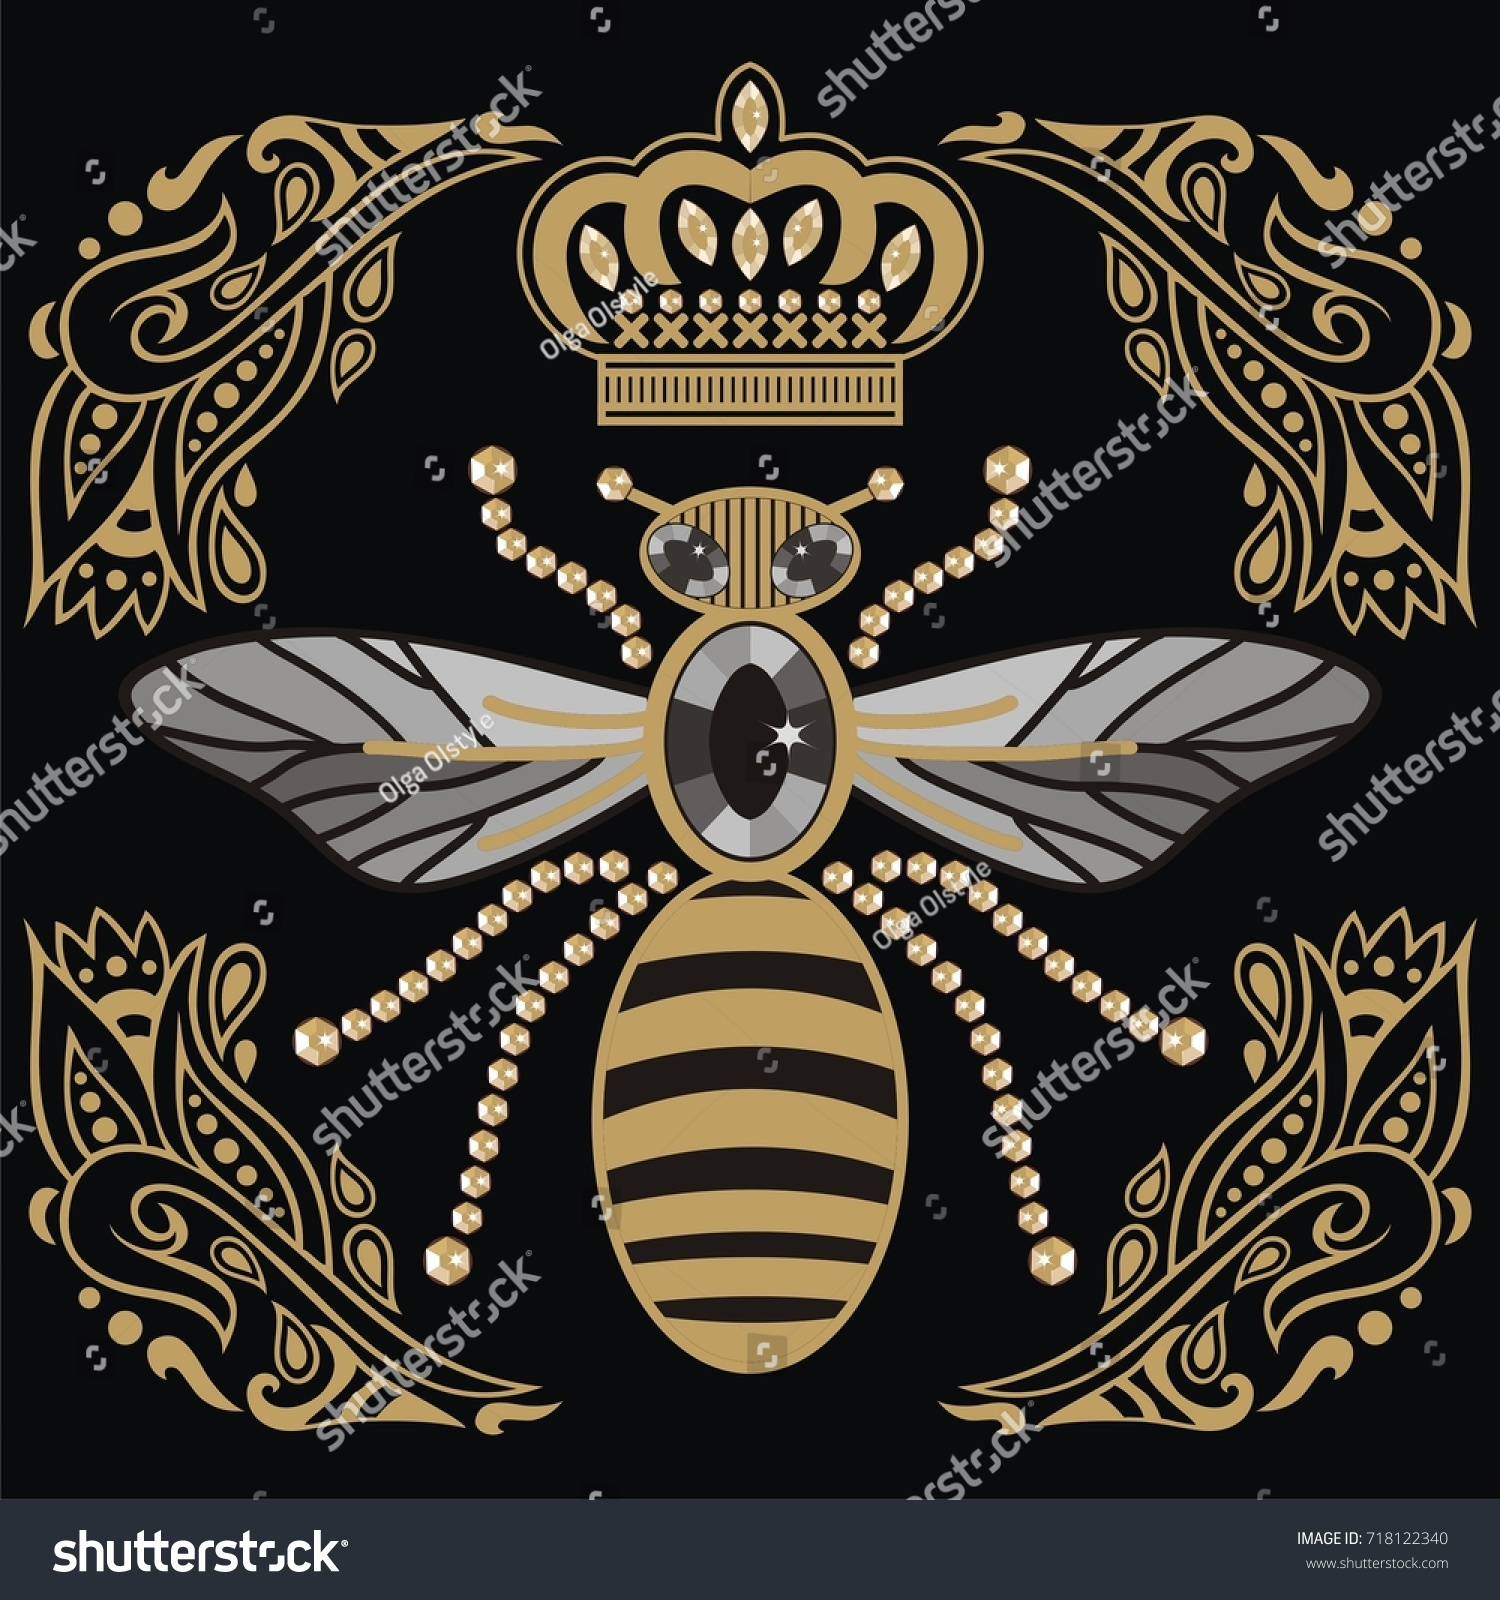 Vector Antique Heraldry Emblem Bee Ornate Stock Vector Royalty Free